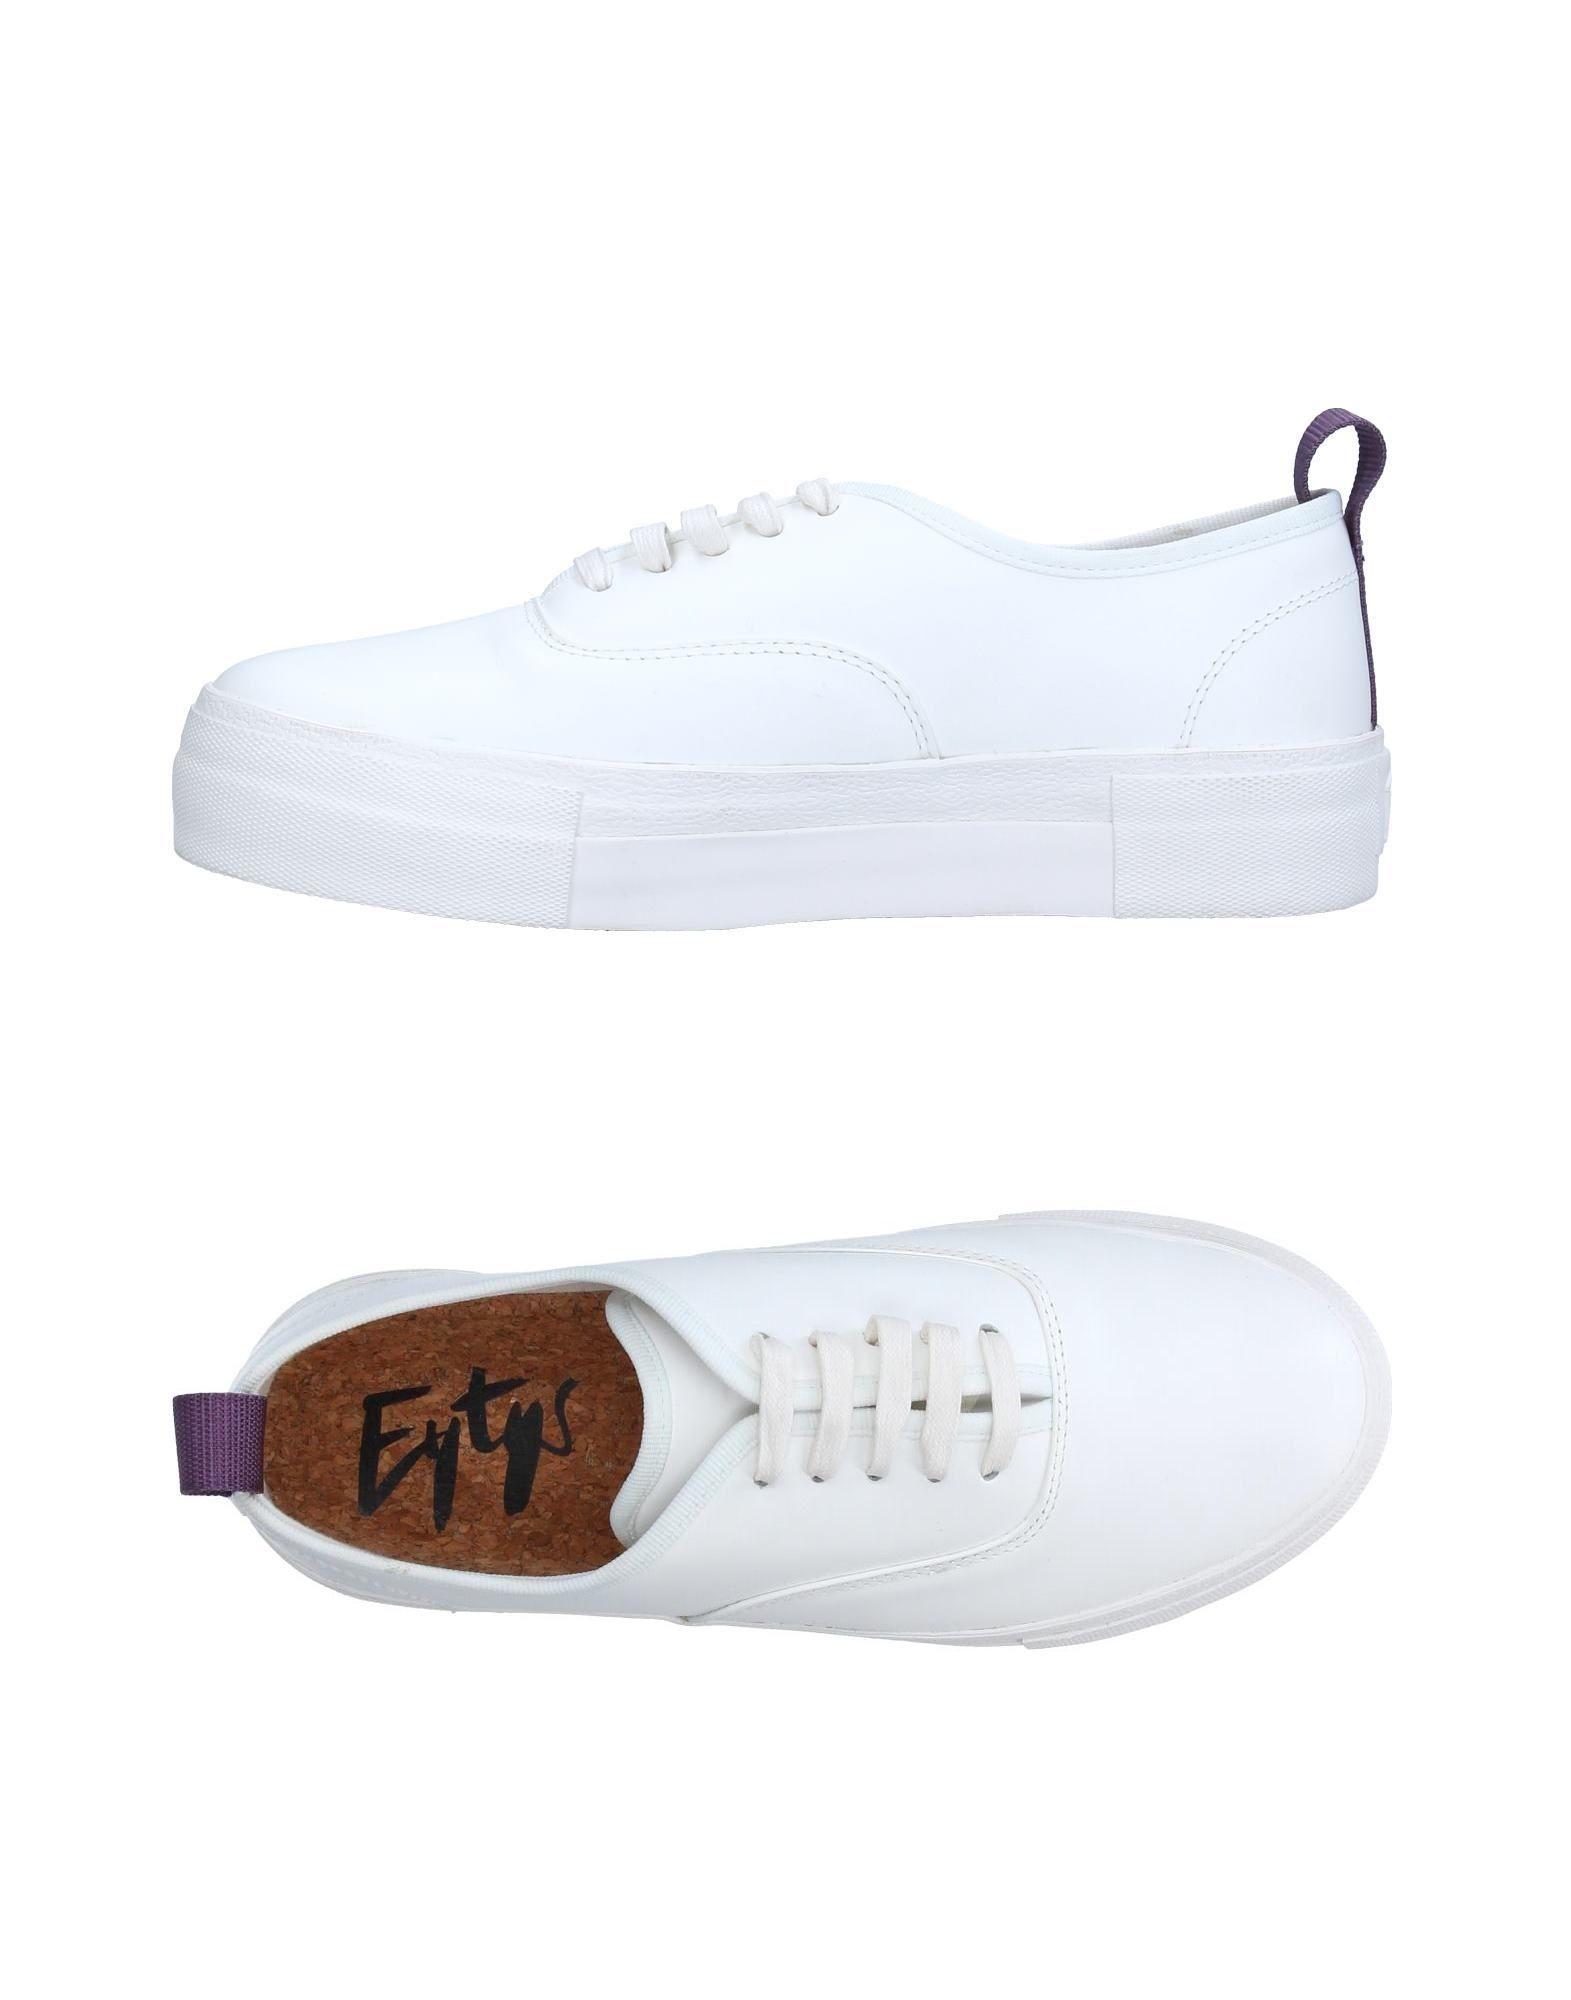 Moda Sneakers Eytys Donna - 11250660TA